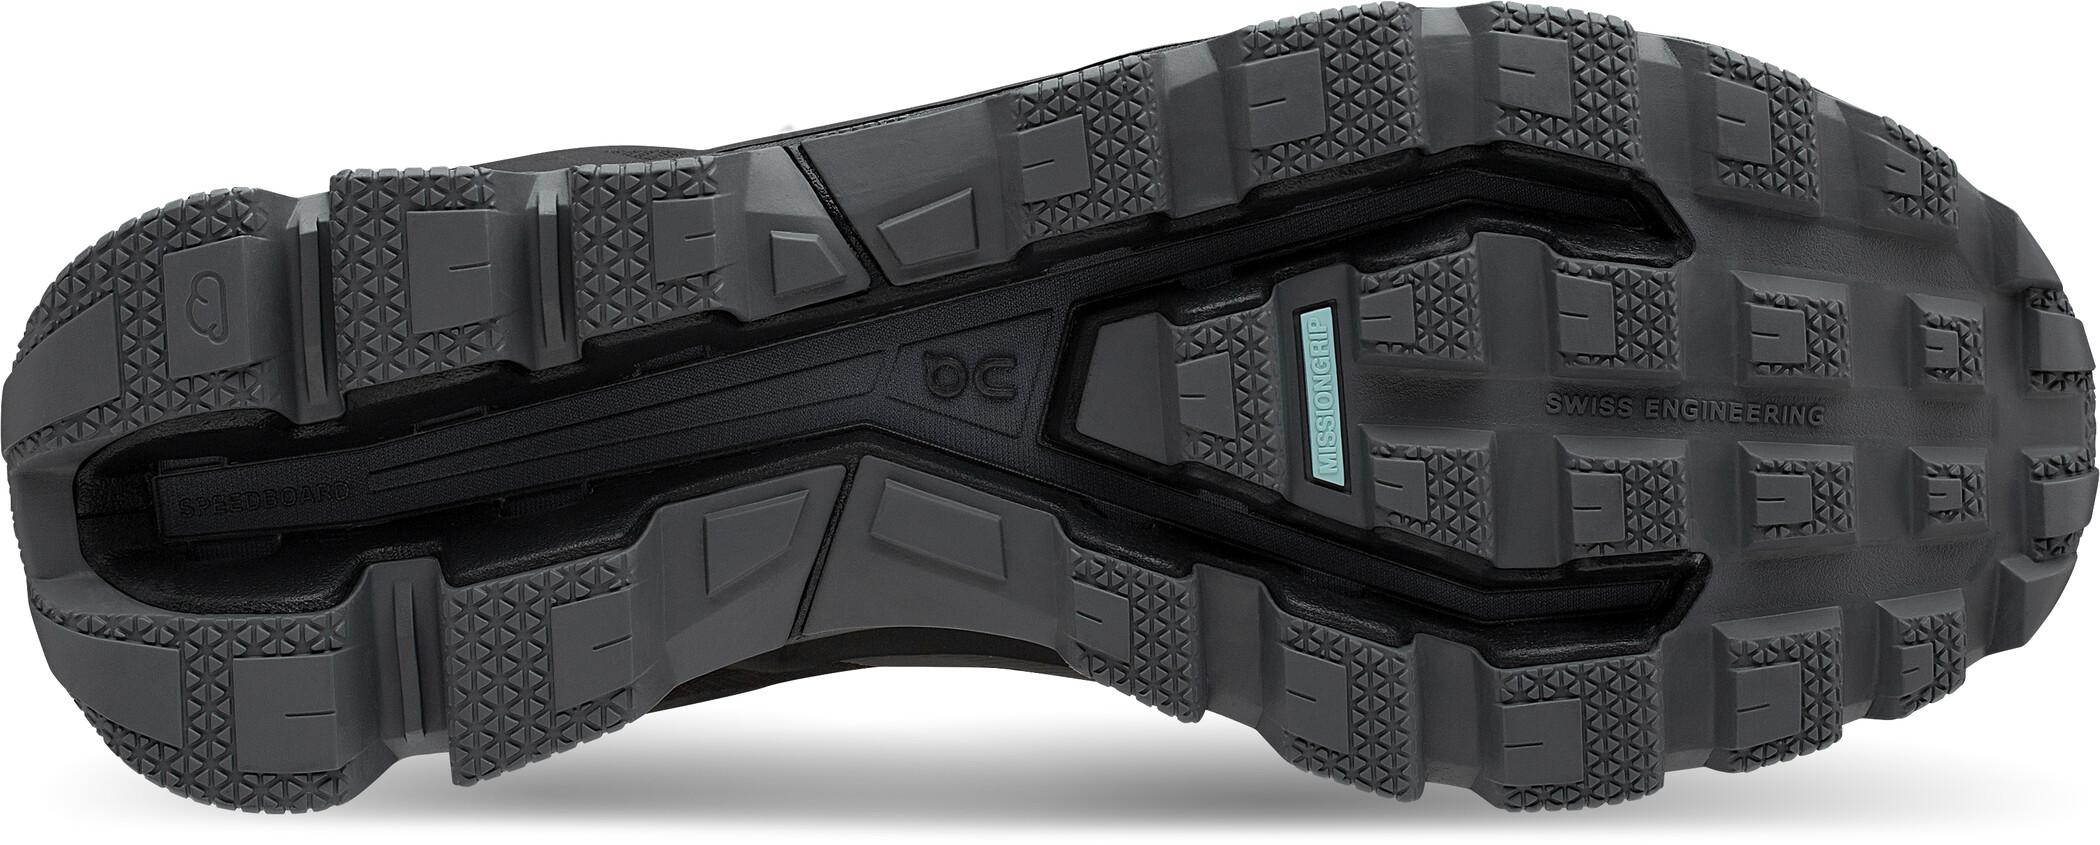 On Cloudventure Waterproof Shoes Women blackgraphite